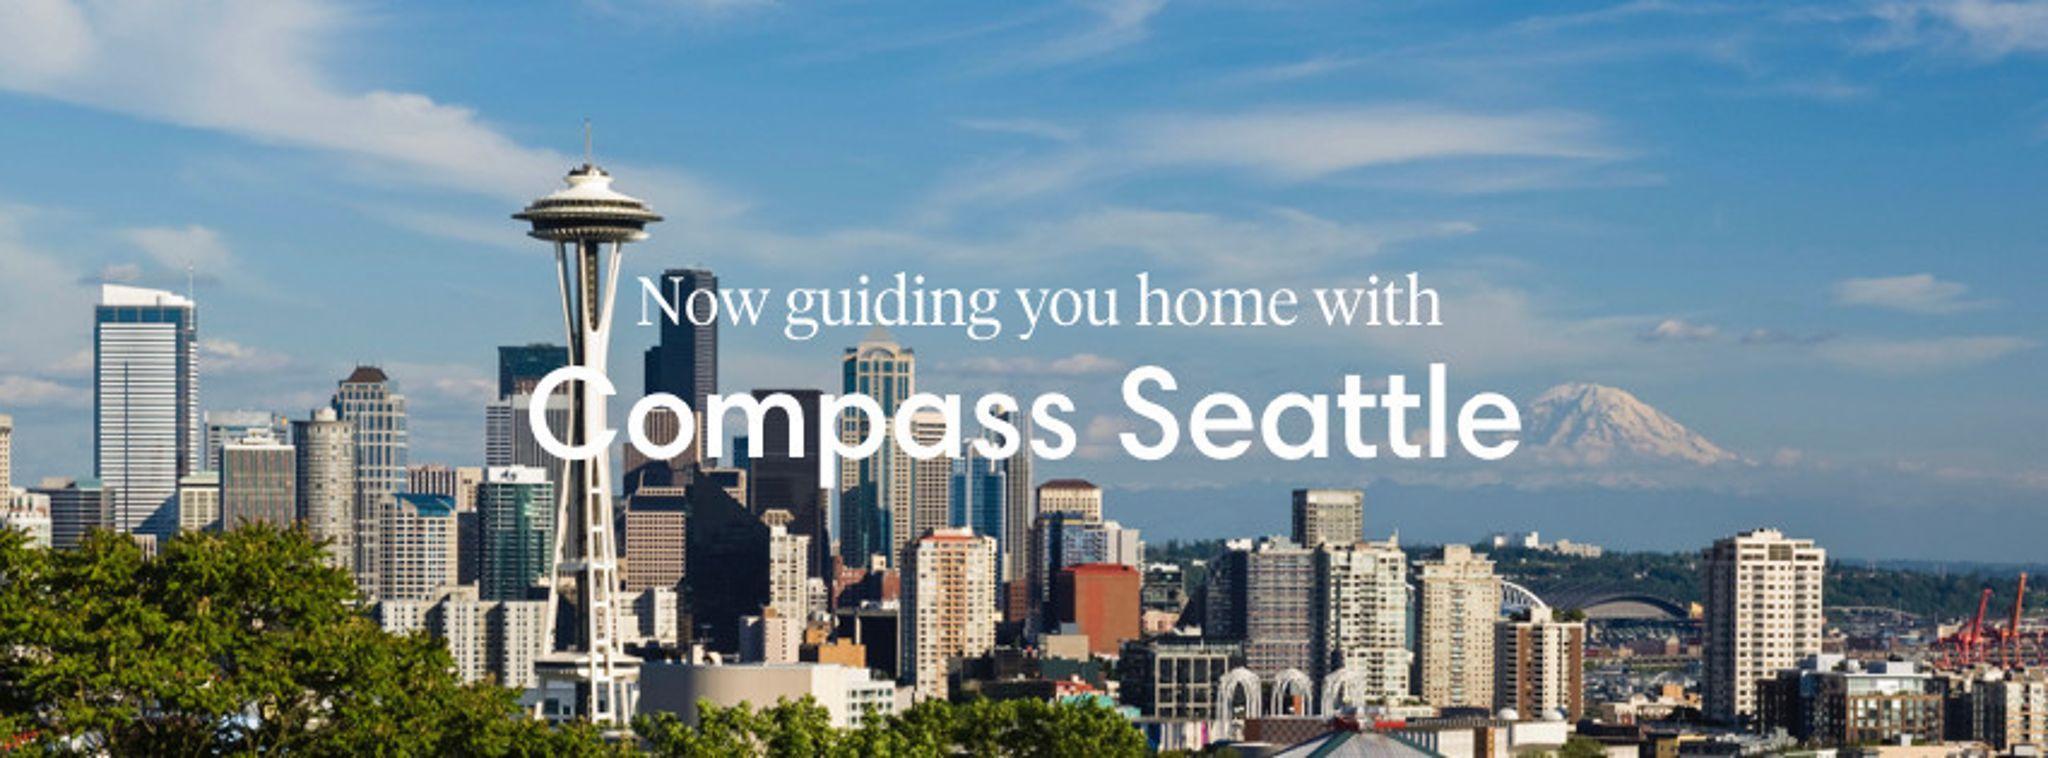 Facebook Headers_Seattle.007.jpeg